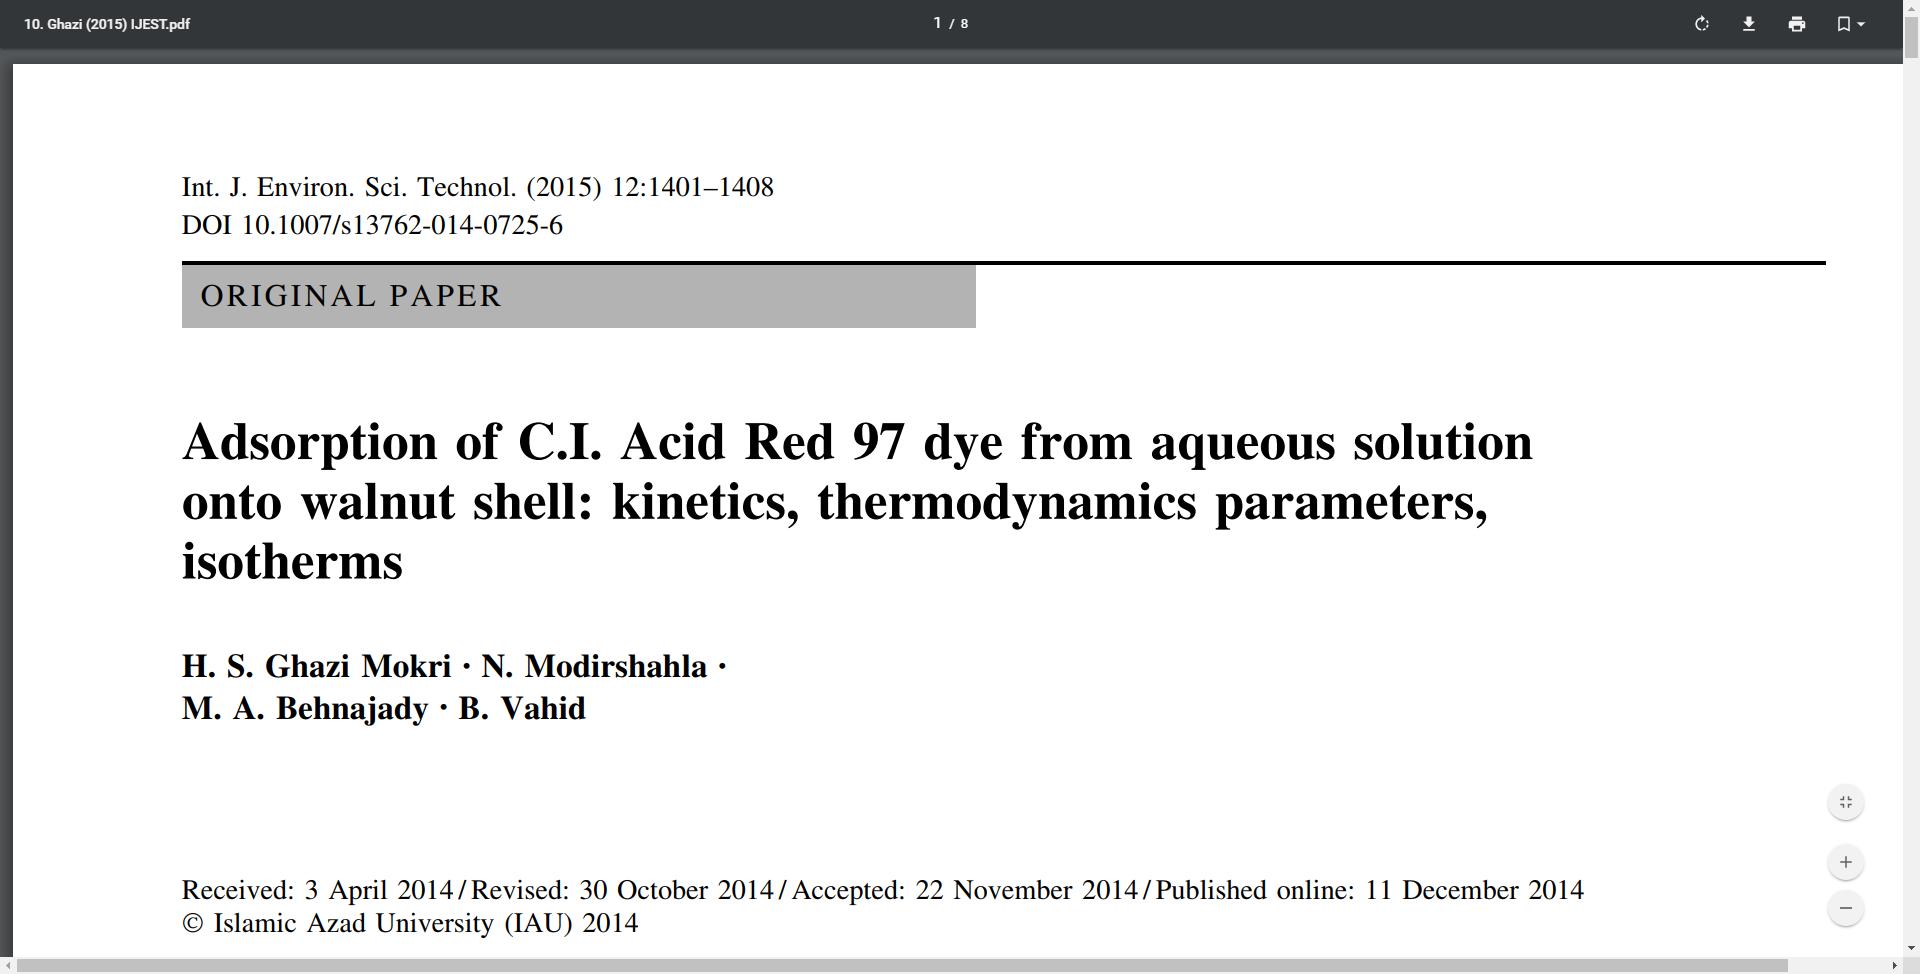 Adsorption of C.I